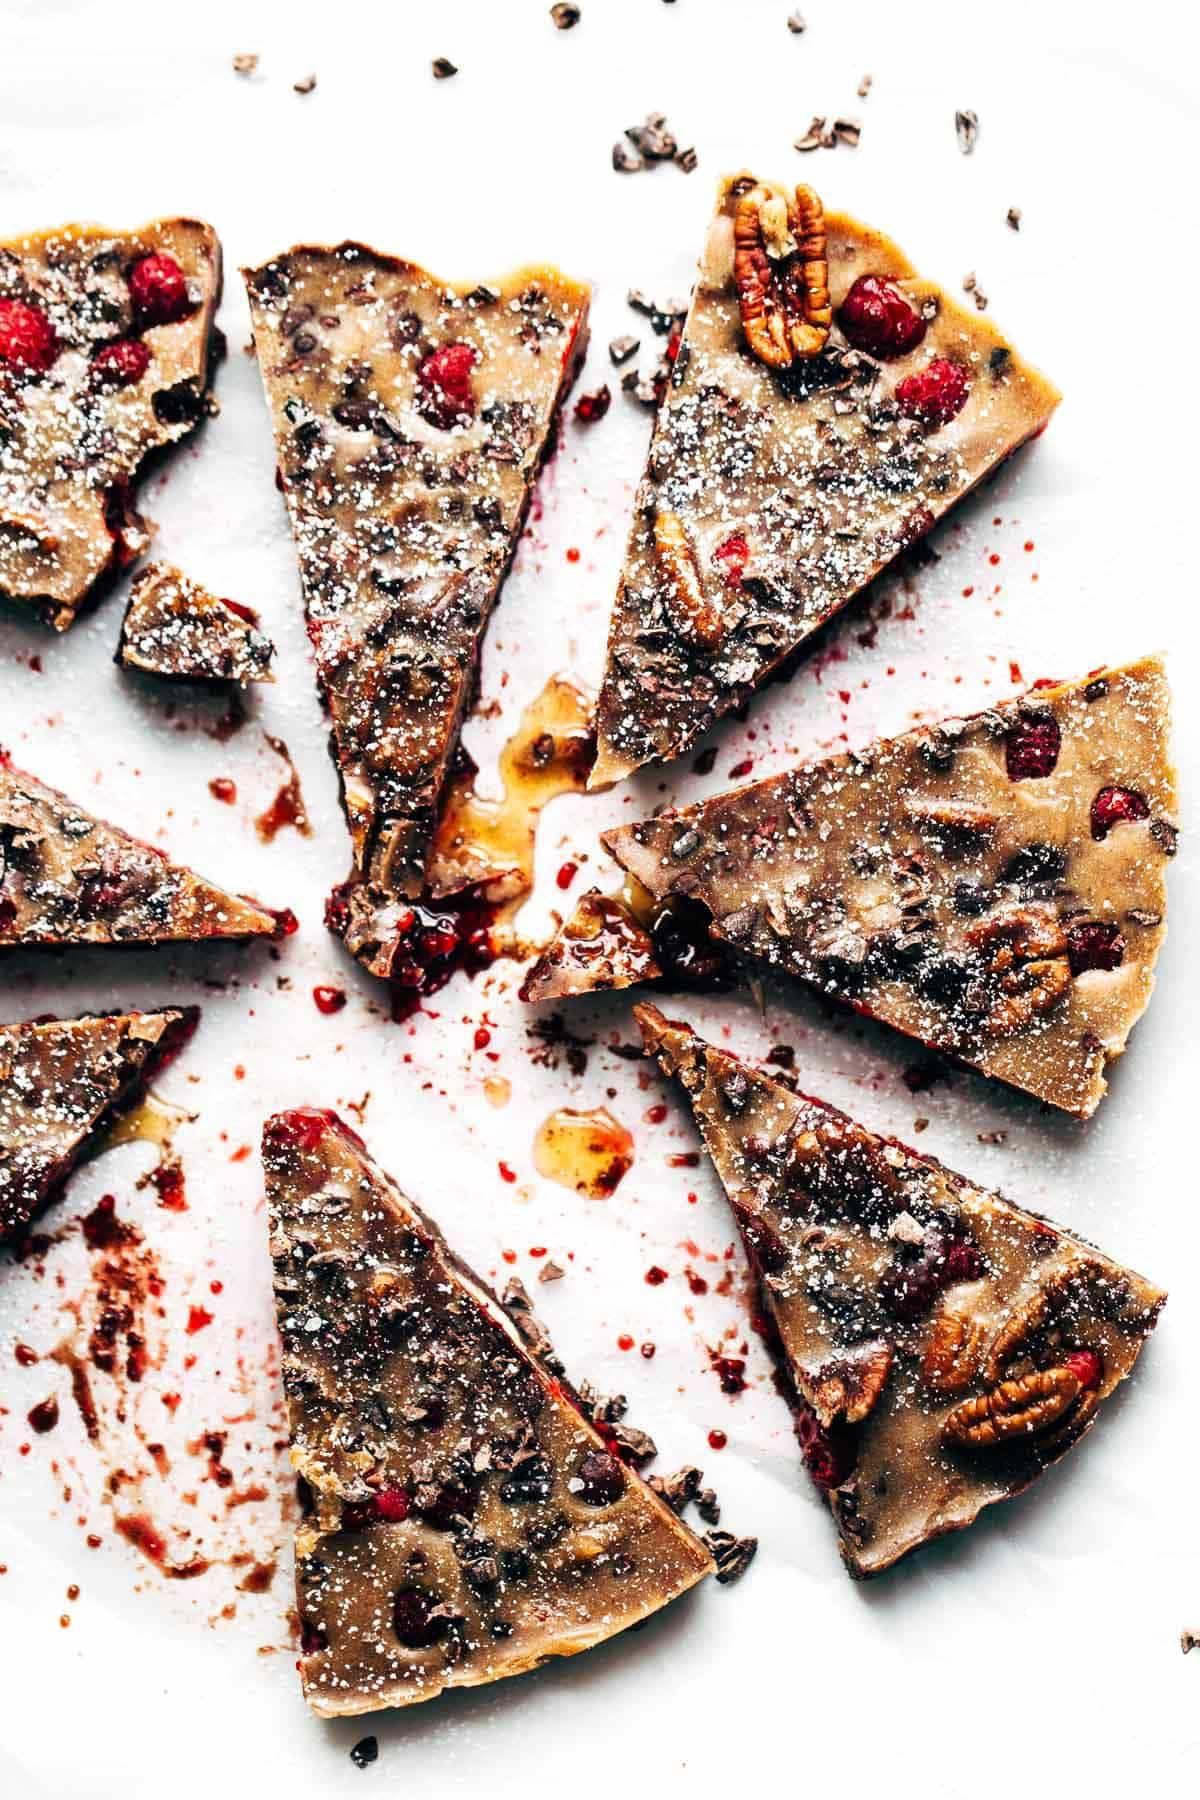 Chocolate Raspberry Almond Butter Bar pieces.